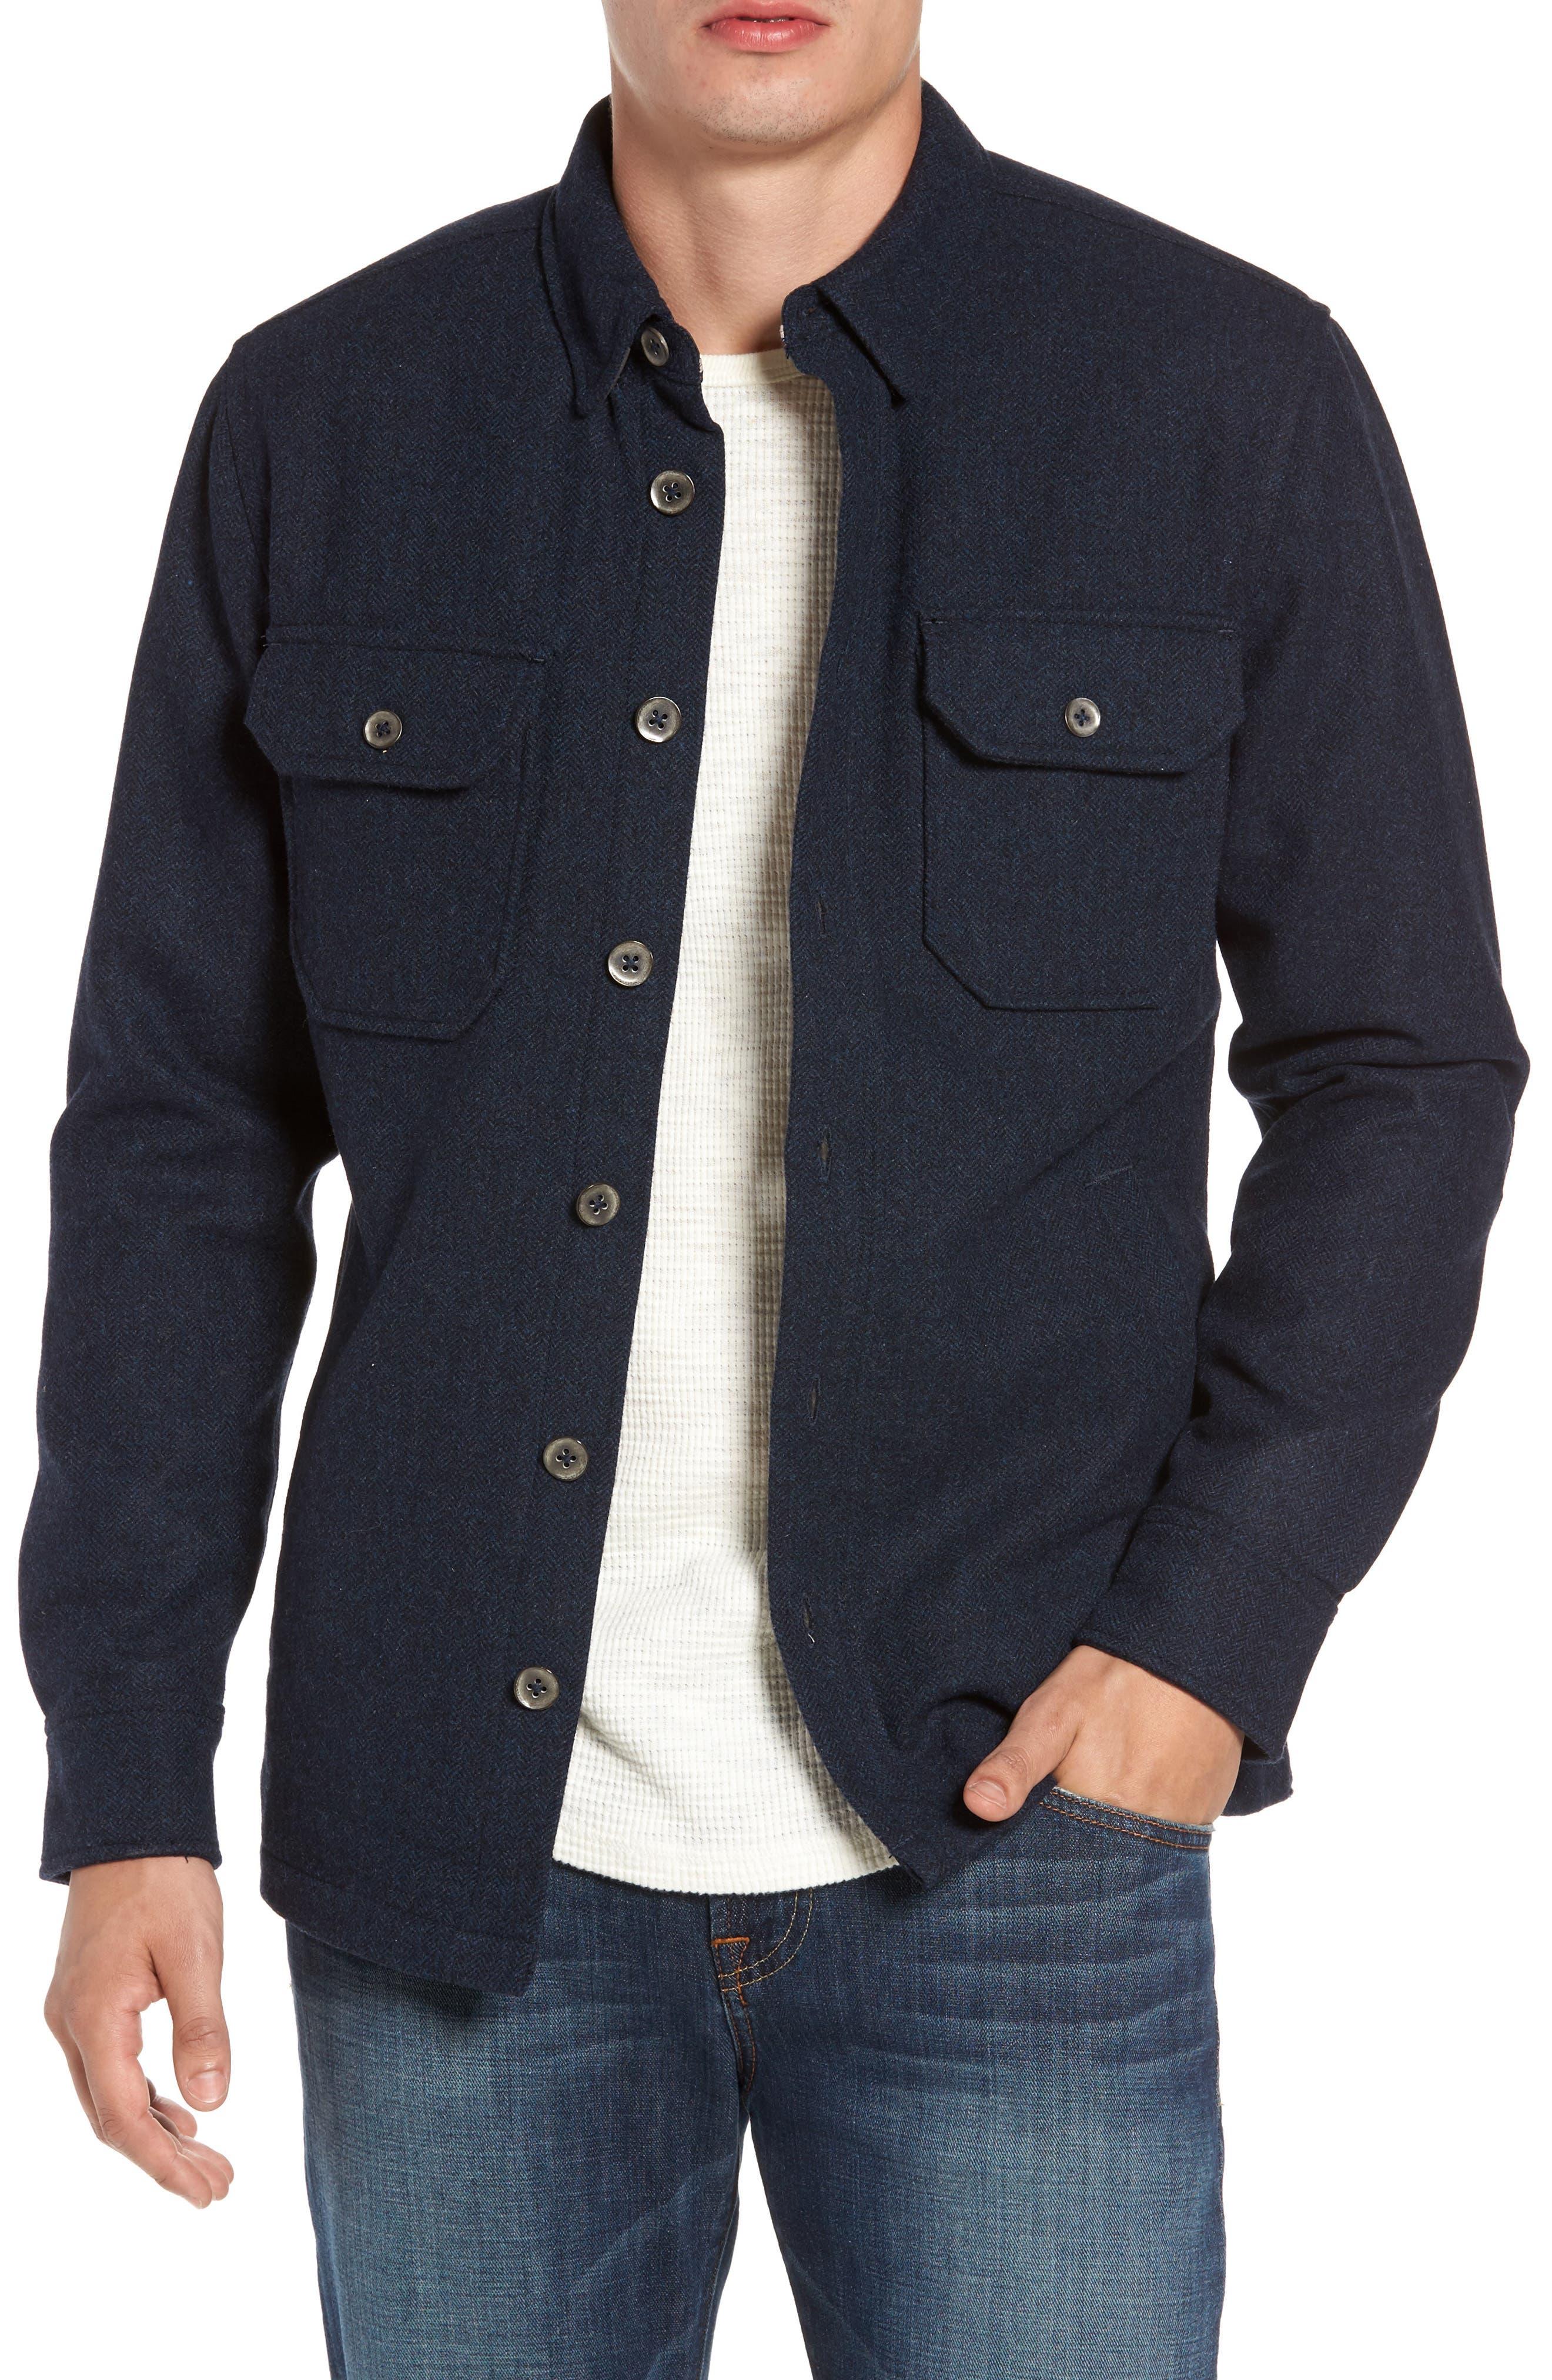 Main Image - Jeremiah Creek Herringbone Wool Shirt Jacket